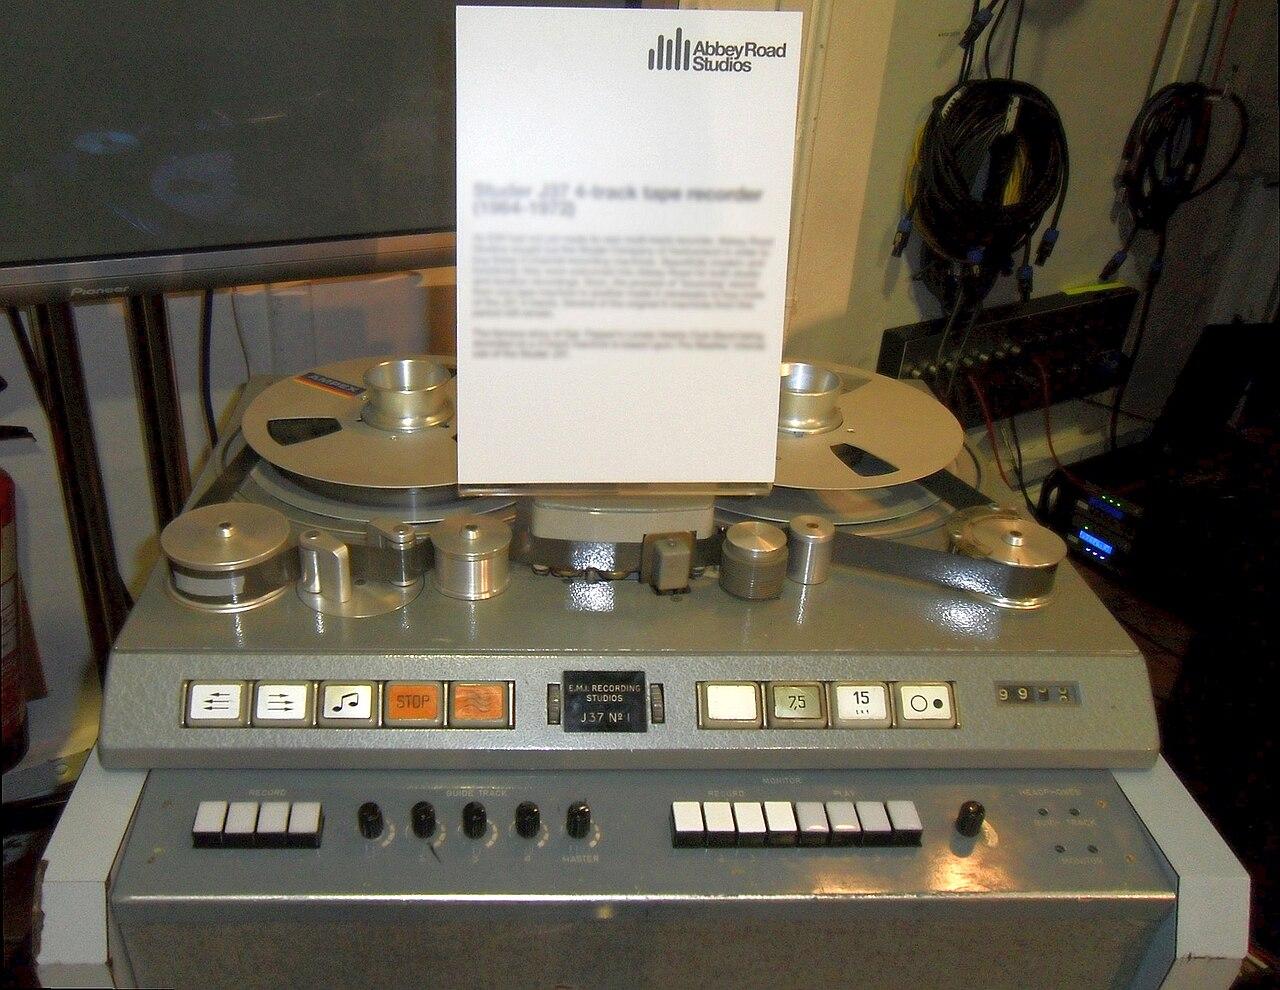 File Studer J37 4 Track Tape Recorder 1964 1972 Abbey